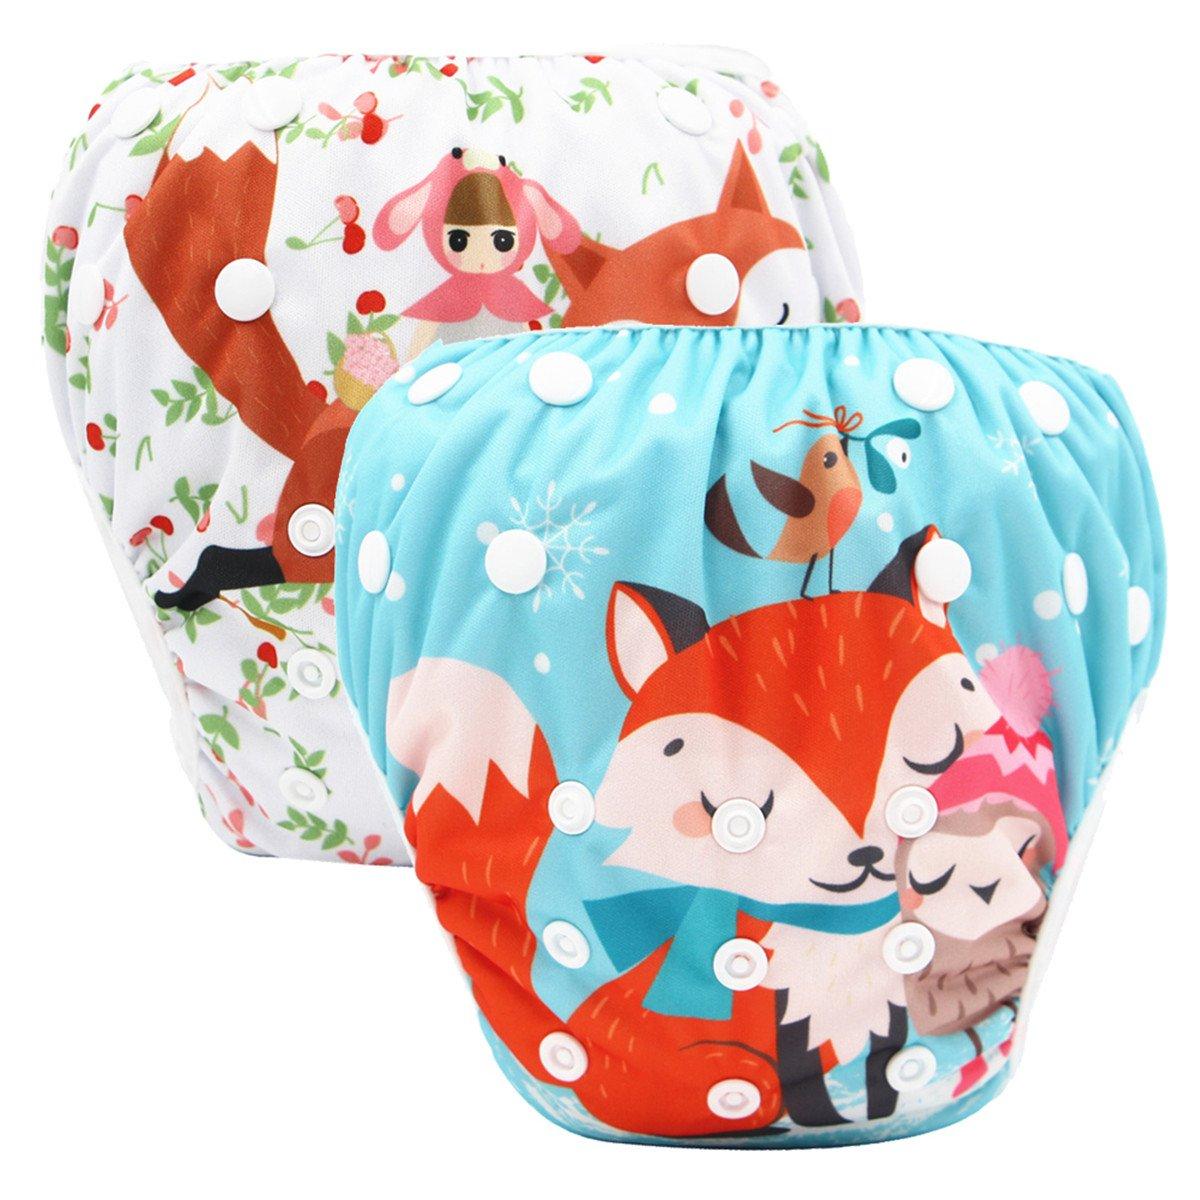 Storeofbaby Baby Swim Diapers Reusable Waterproof